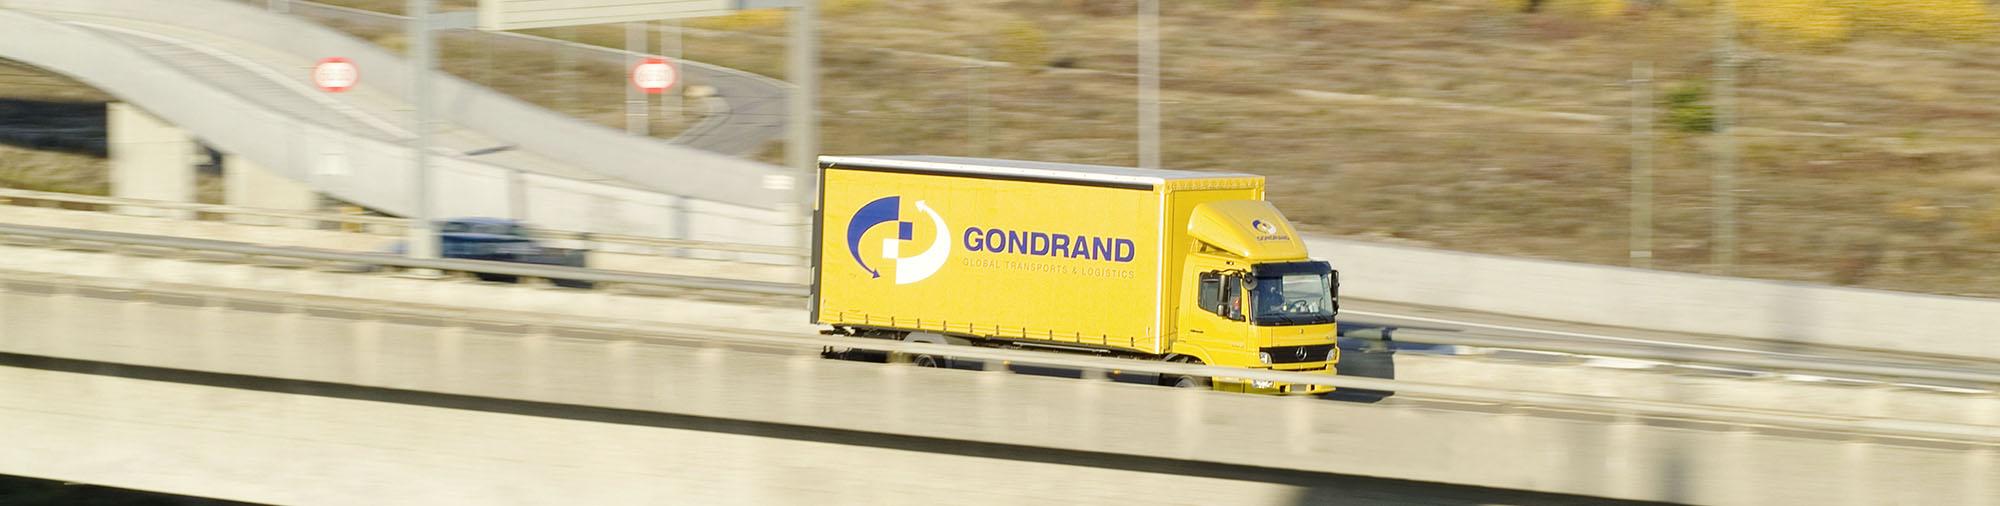 Gondrand Truck